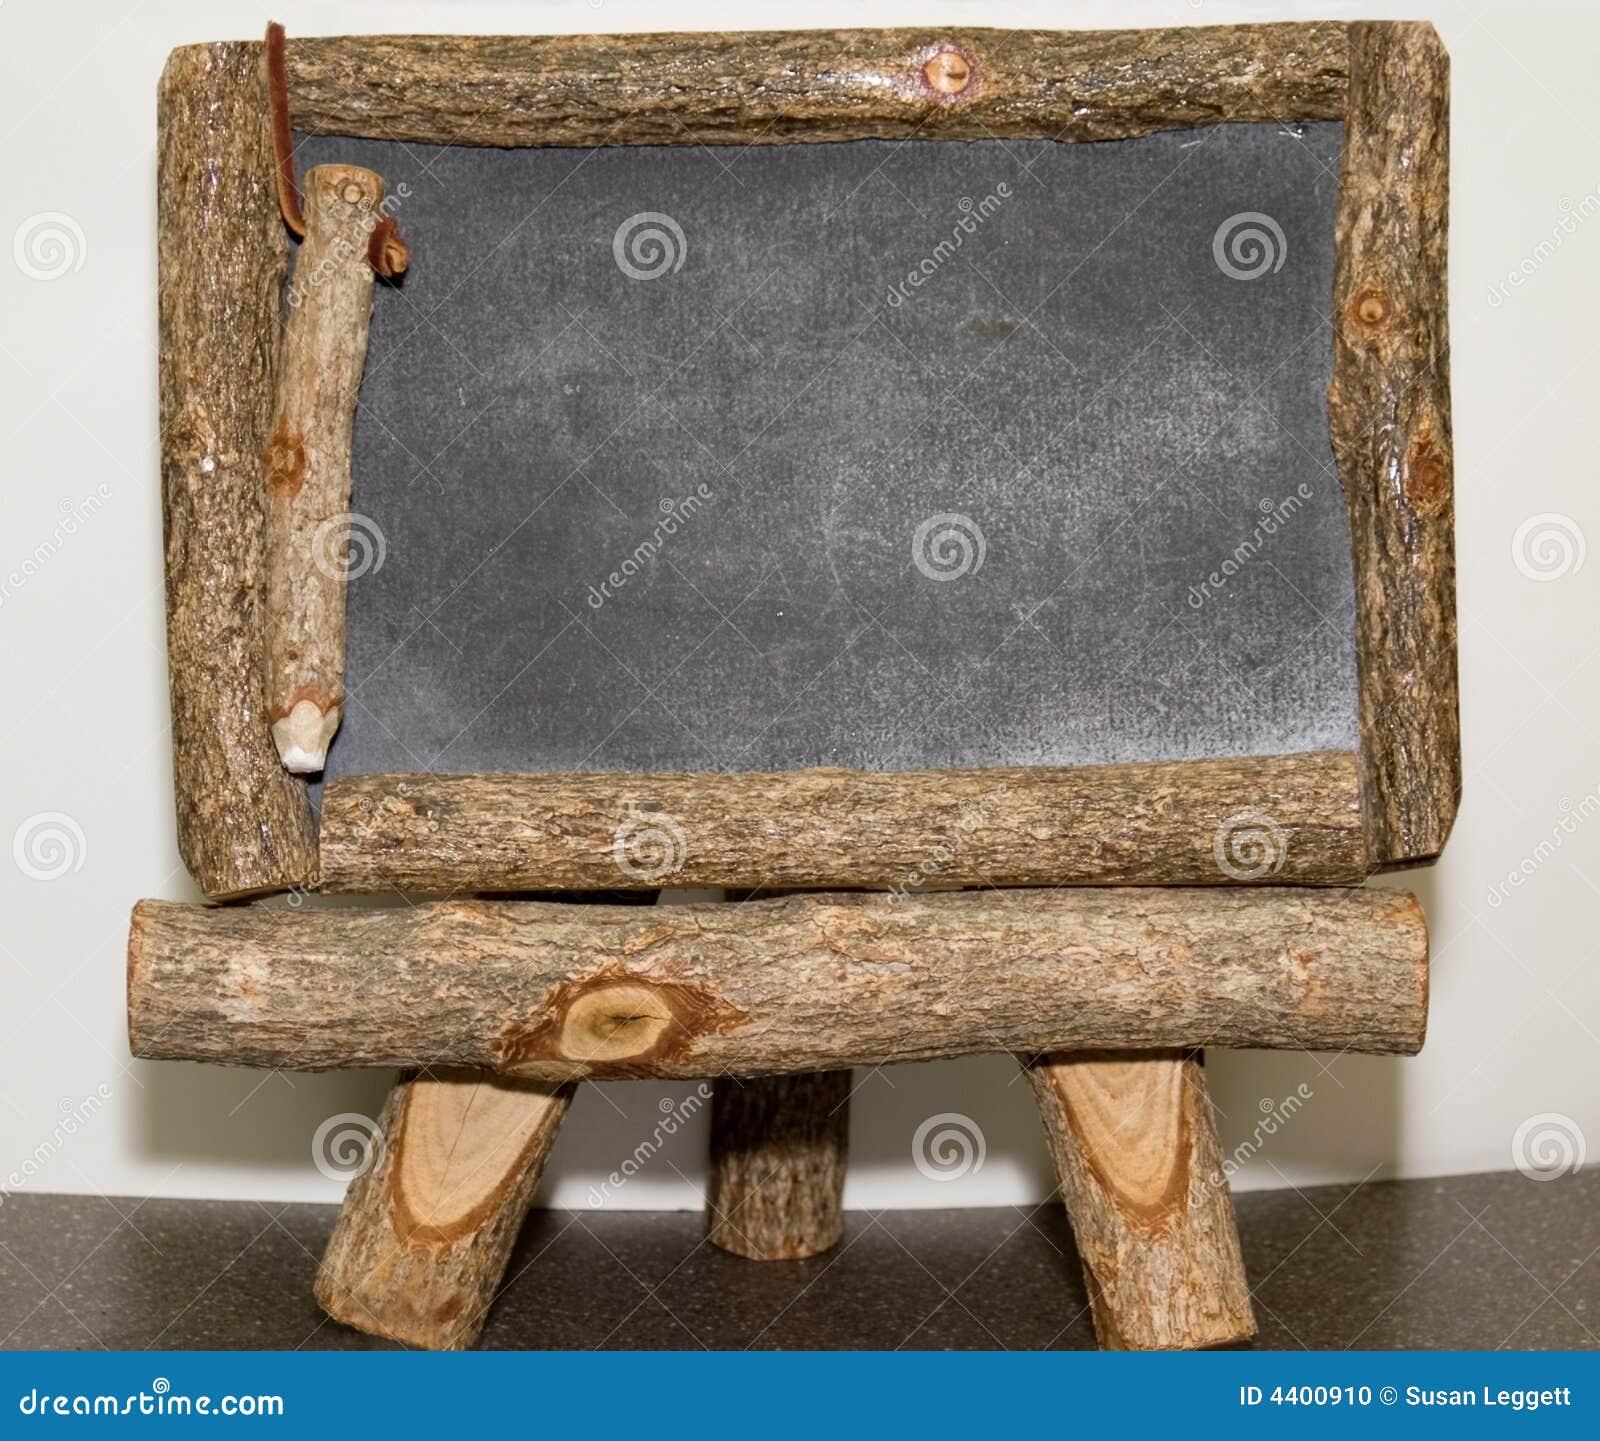 Rustic chalk/note board